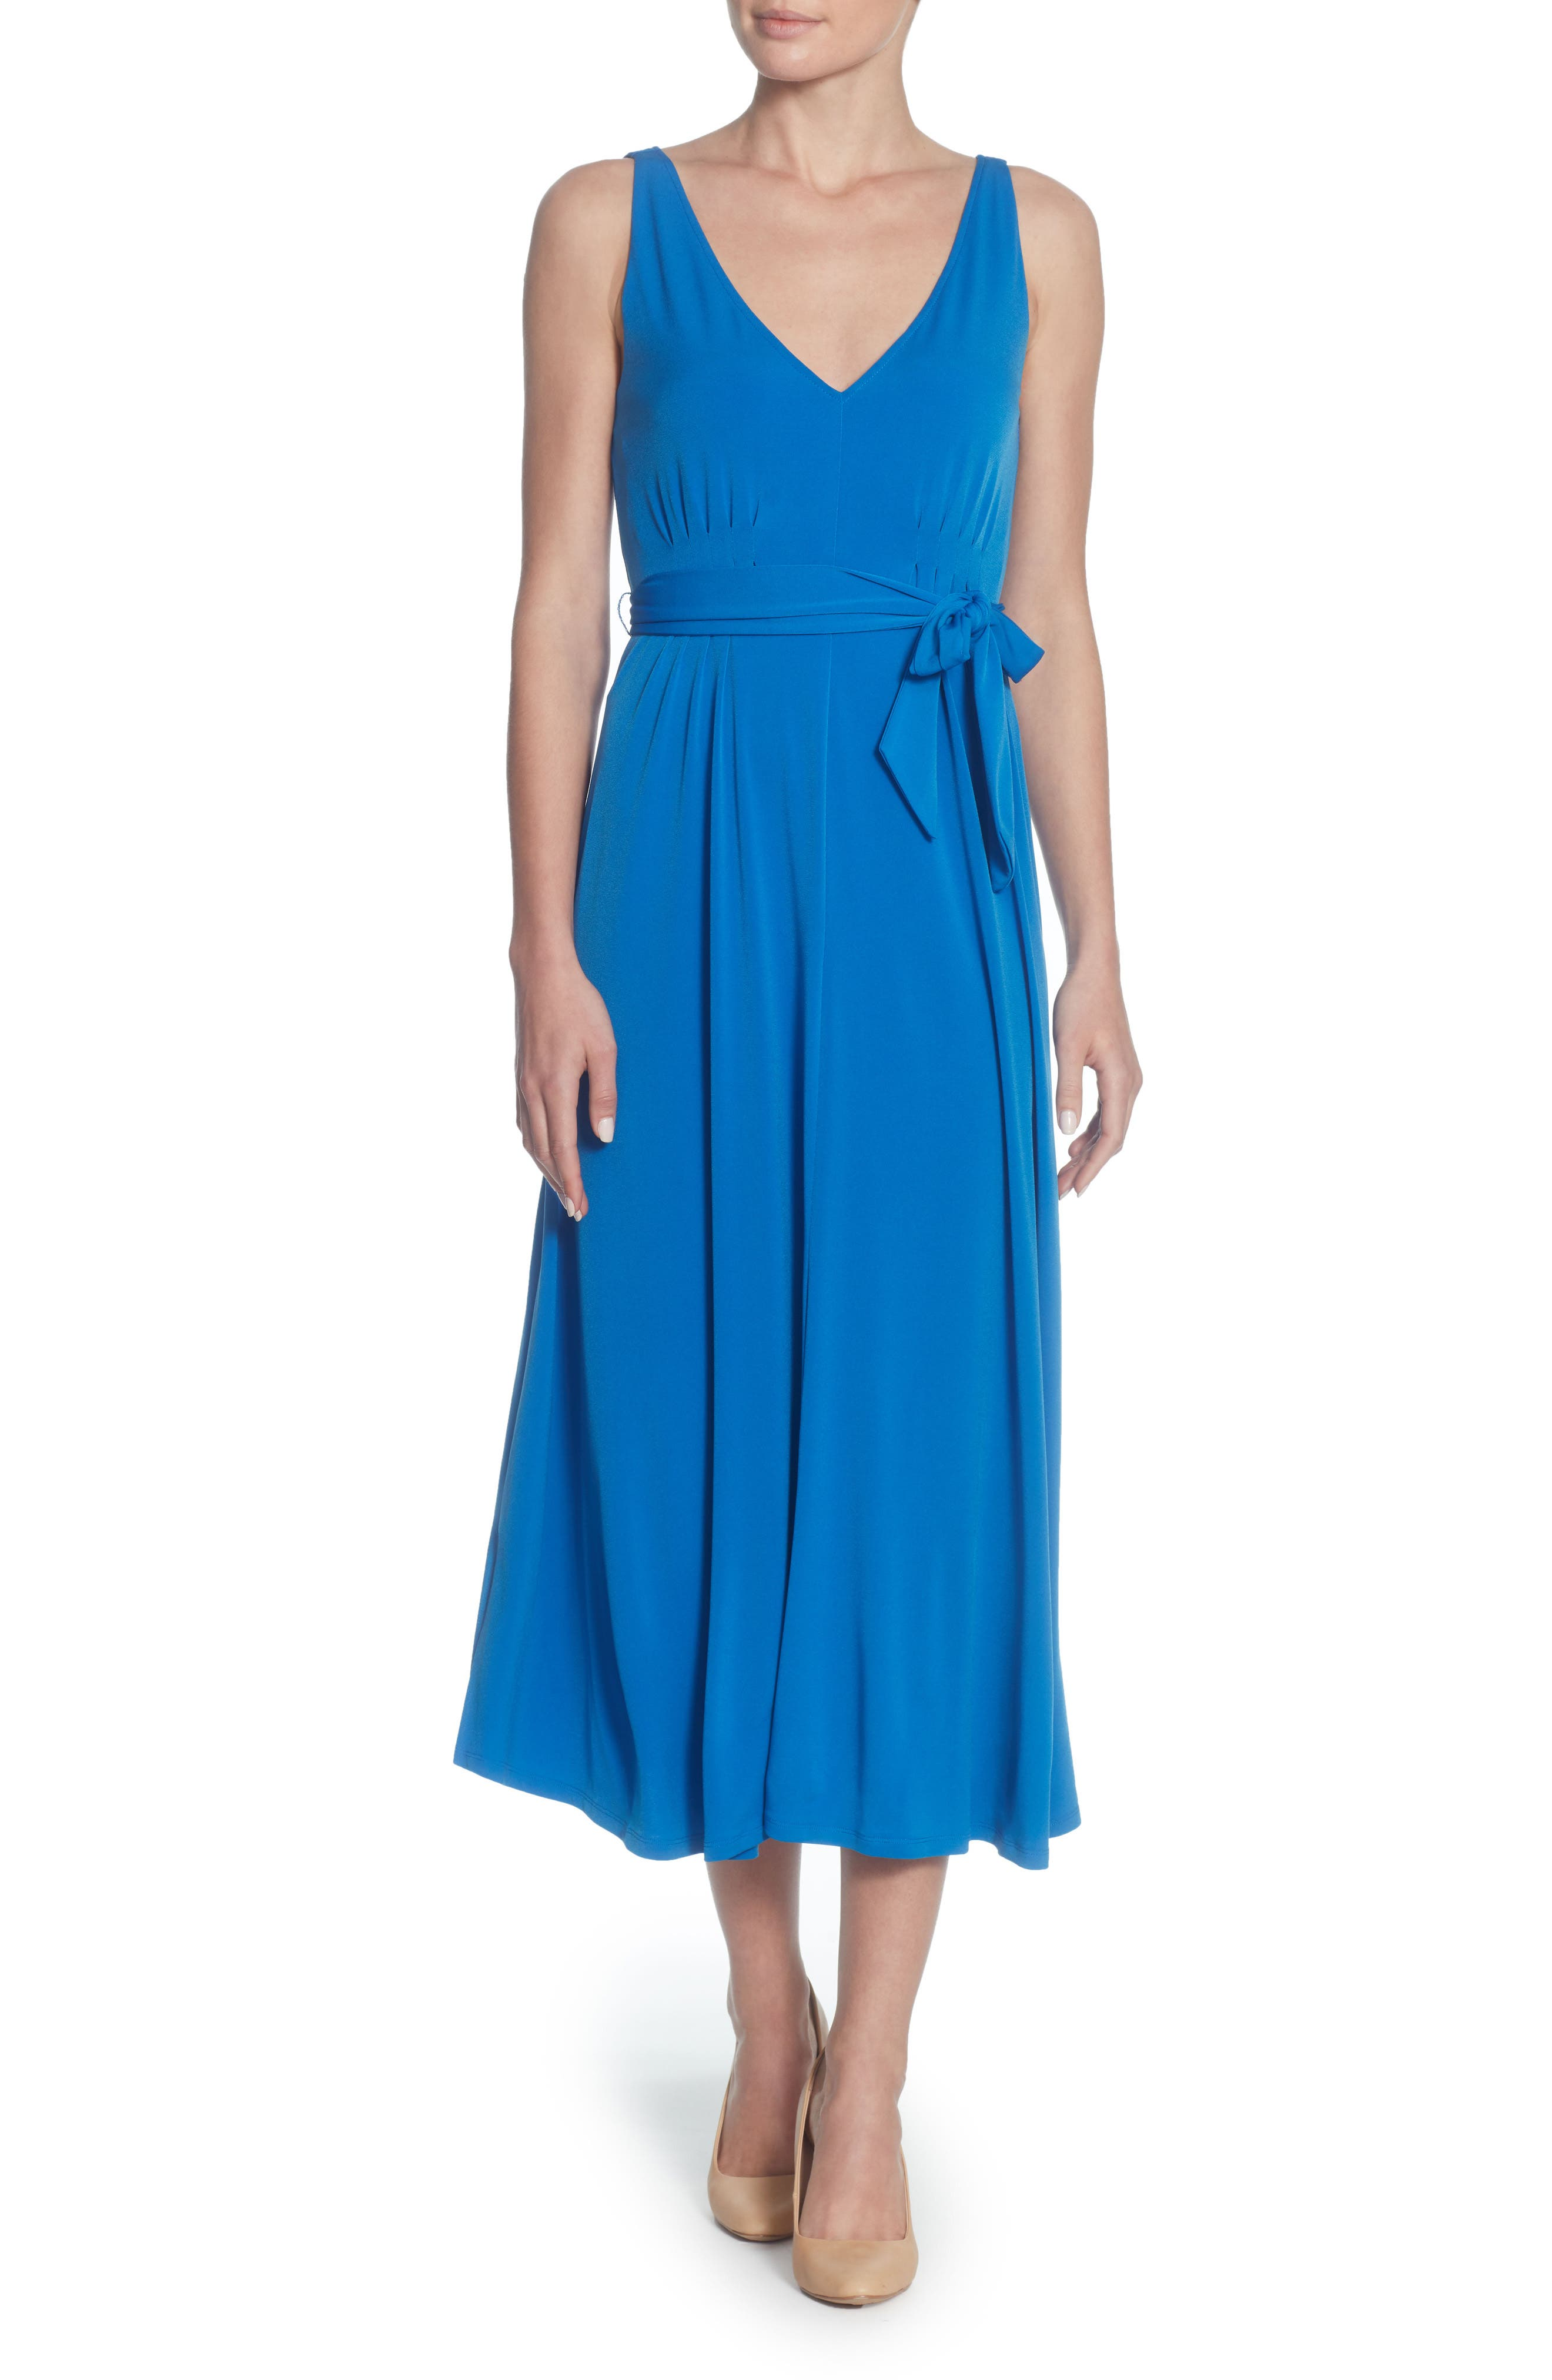 Catherine Catherine Malandrino Lindy Midi Dress, Blue